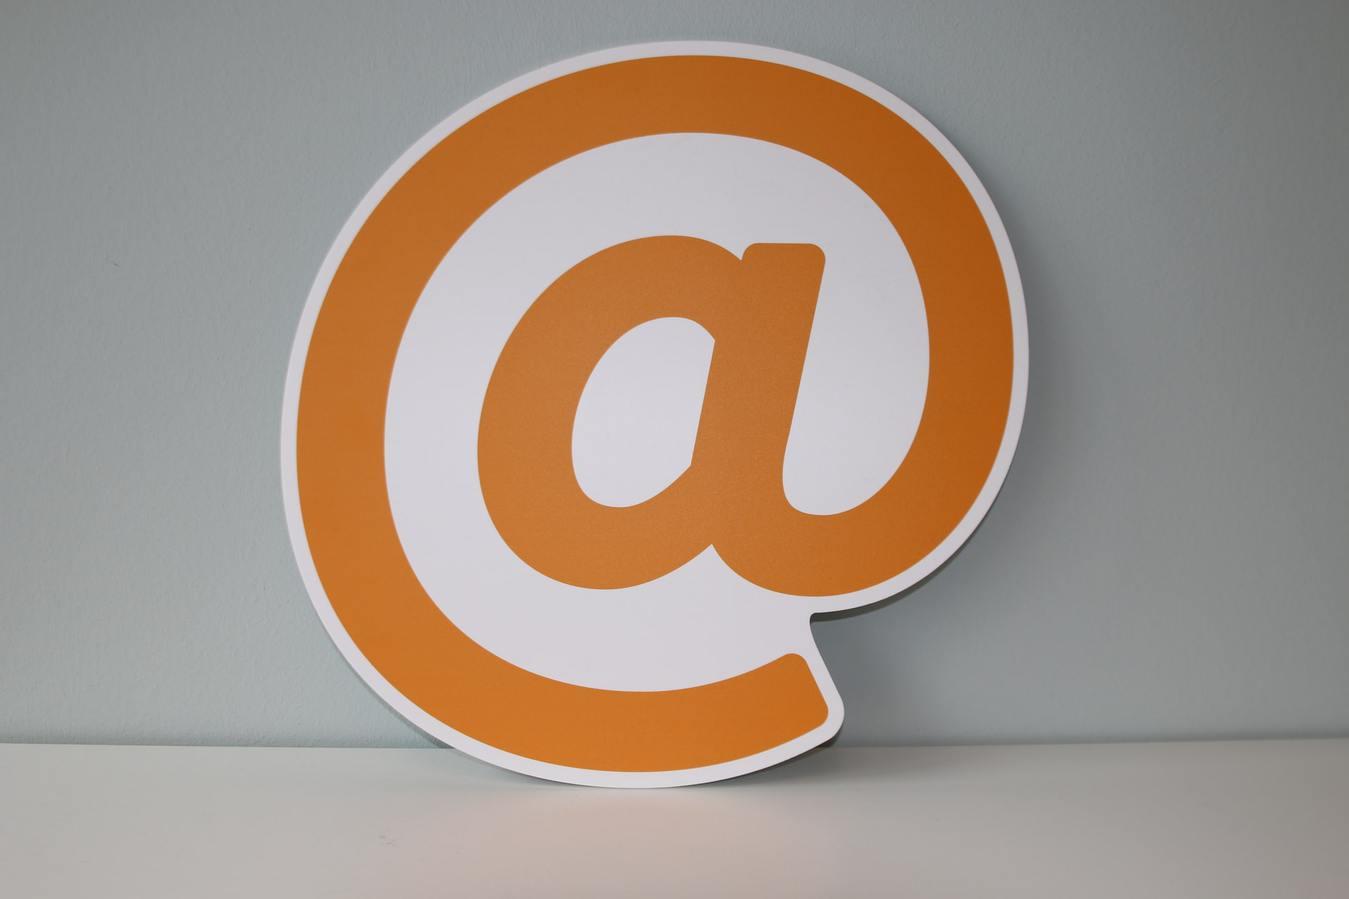 Símbolo de arroba laranja com fundo cinza